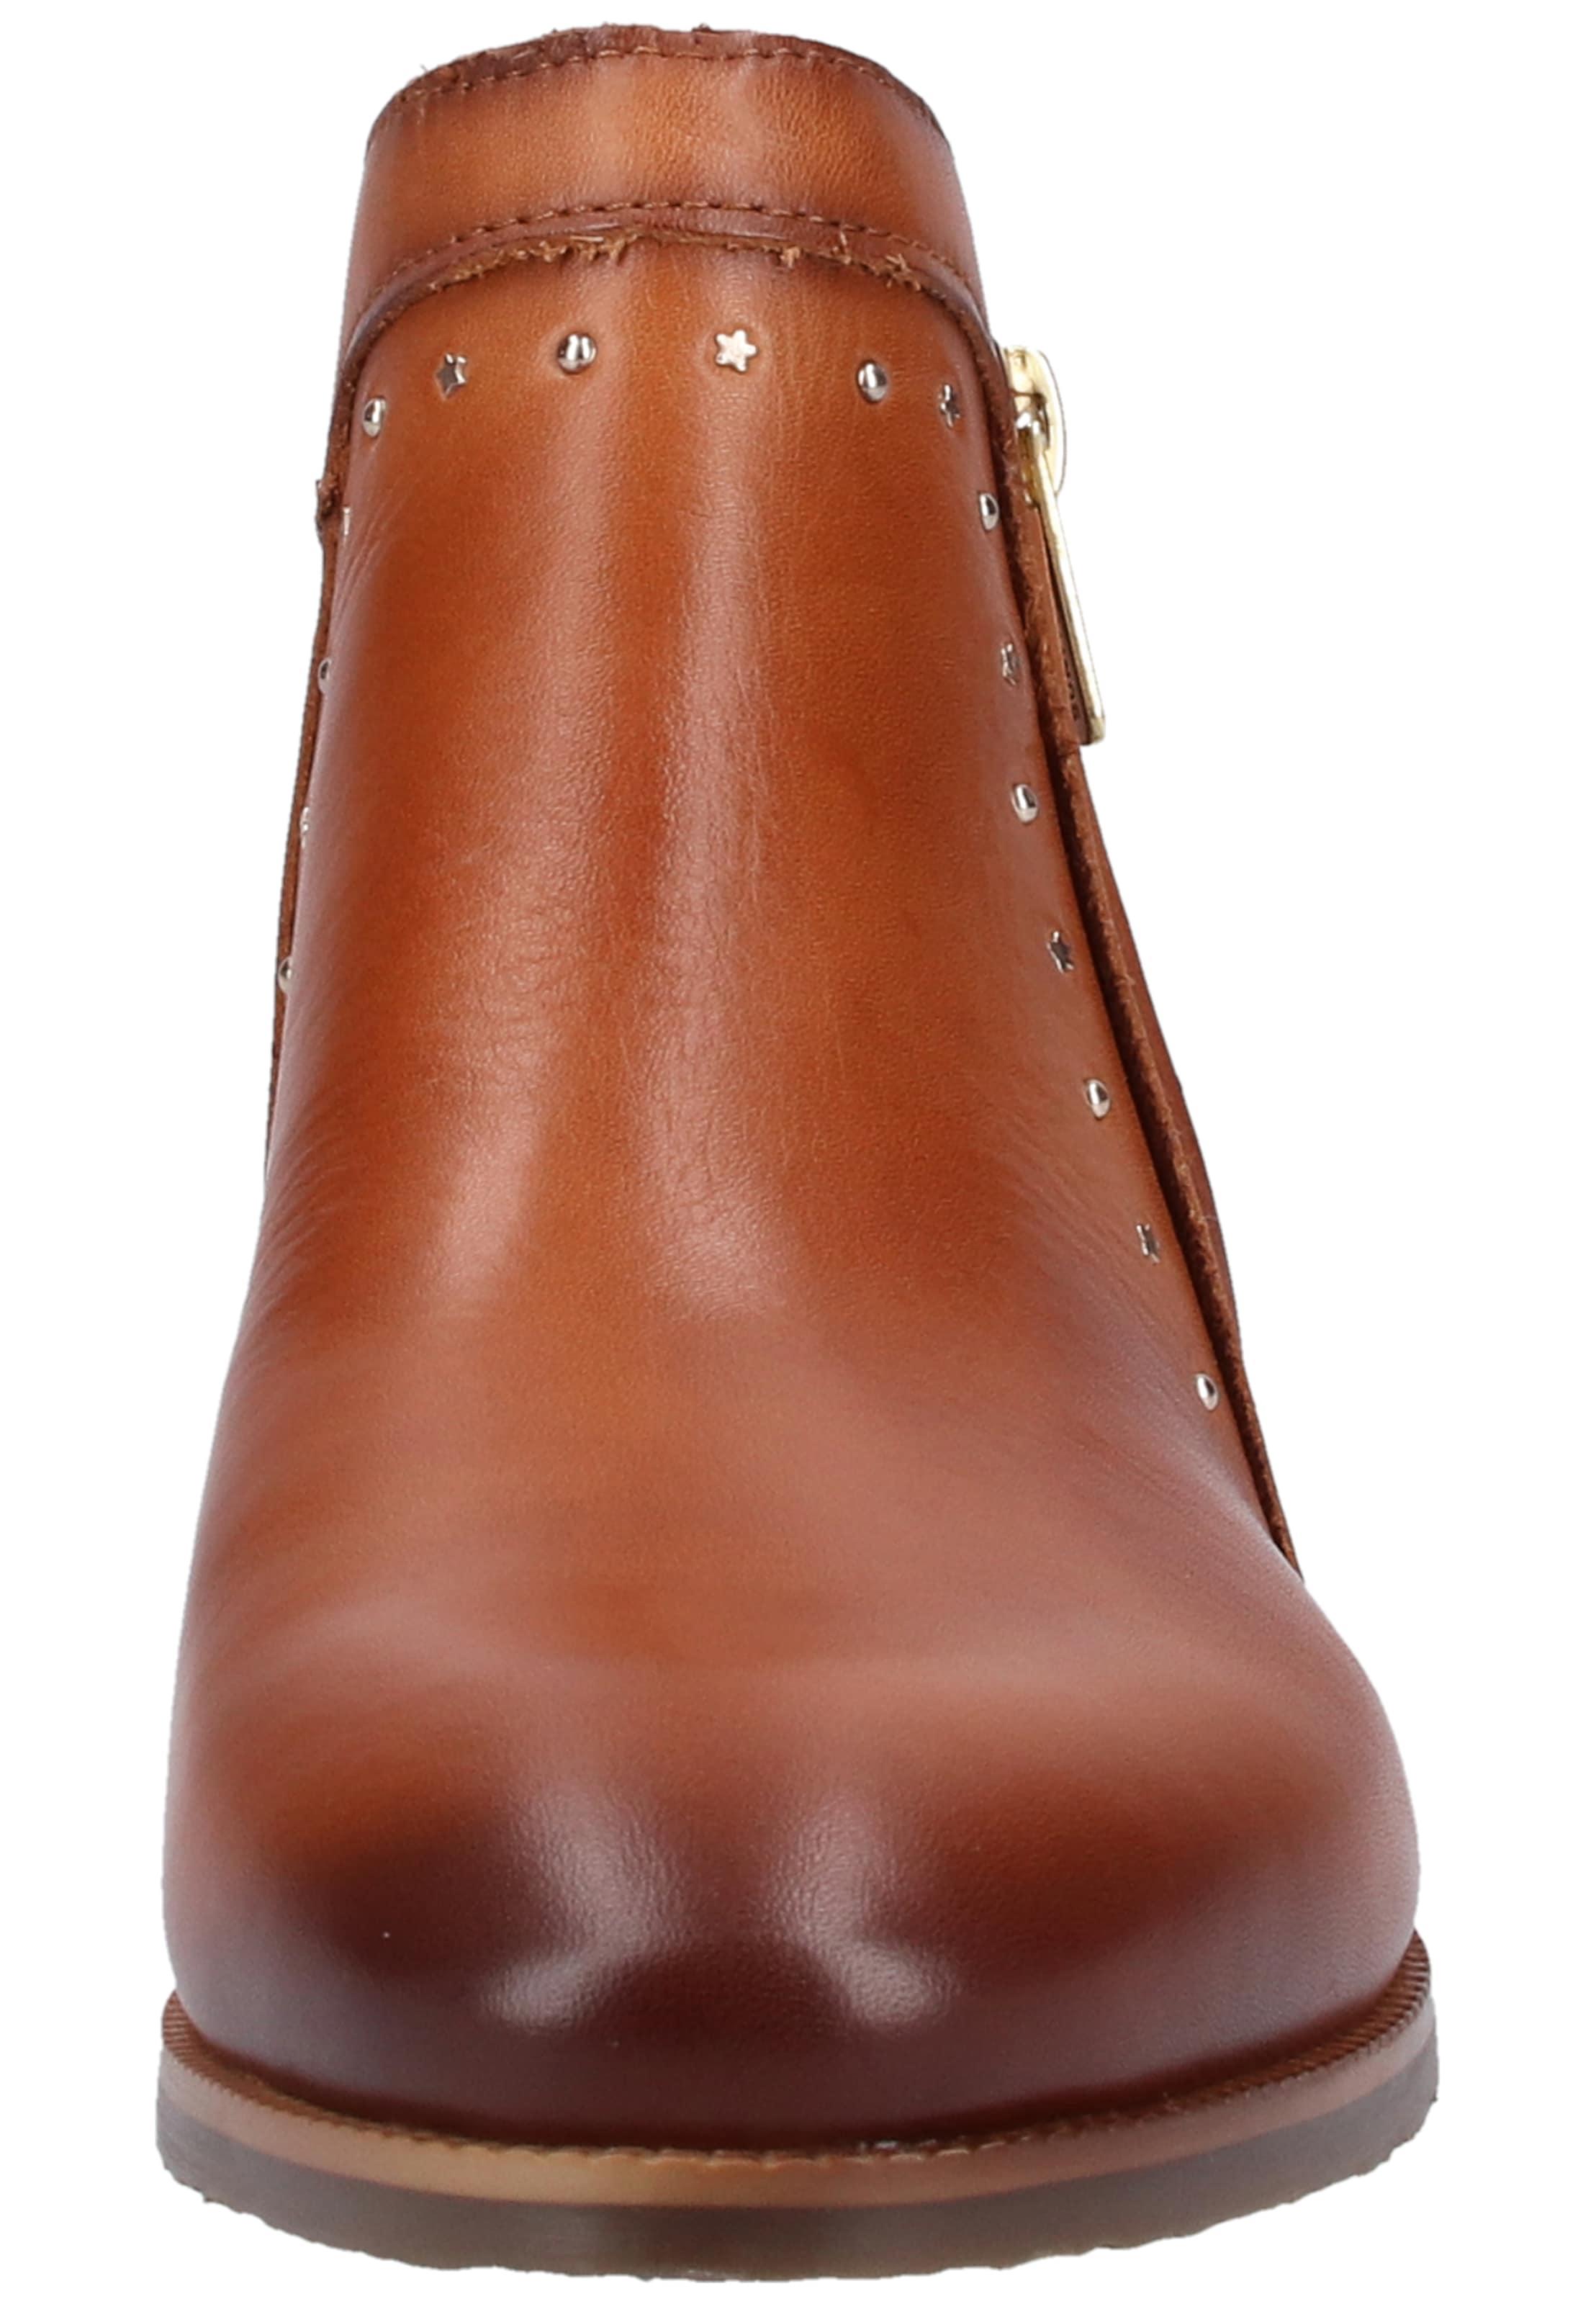 Pikolinos Stiefelette Cognac In In Stiefelette Pikolinos In Stiefelette Cognac Pikolinos wnOP80k